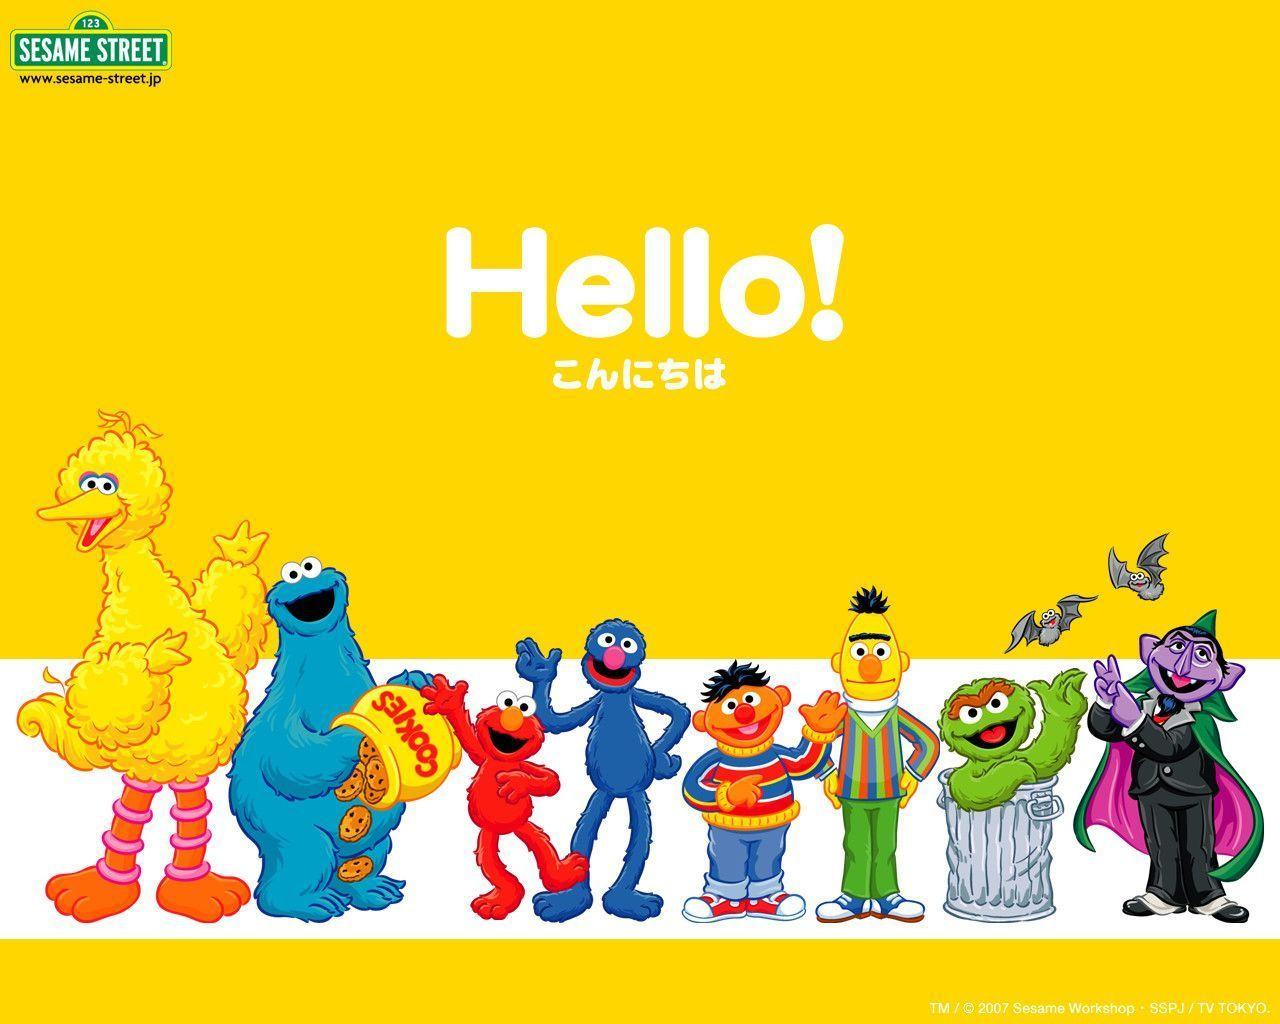 Elmo Wallpaper Hd 1024 768 Elmo Wallpaper 34 Wallpapers Adorable Wallpapers Sesame Street Elmo Wallpaper Sesame